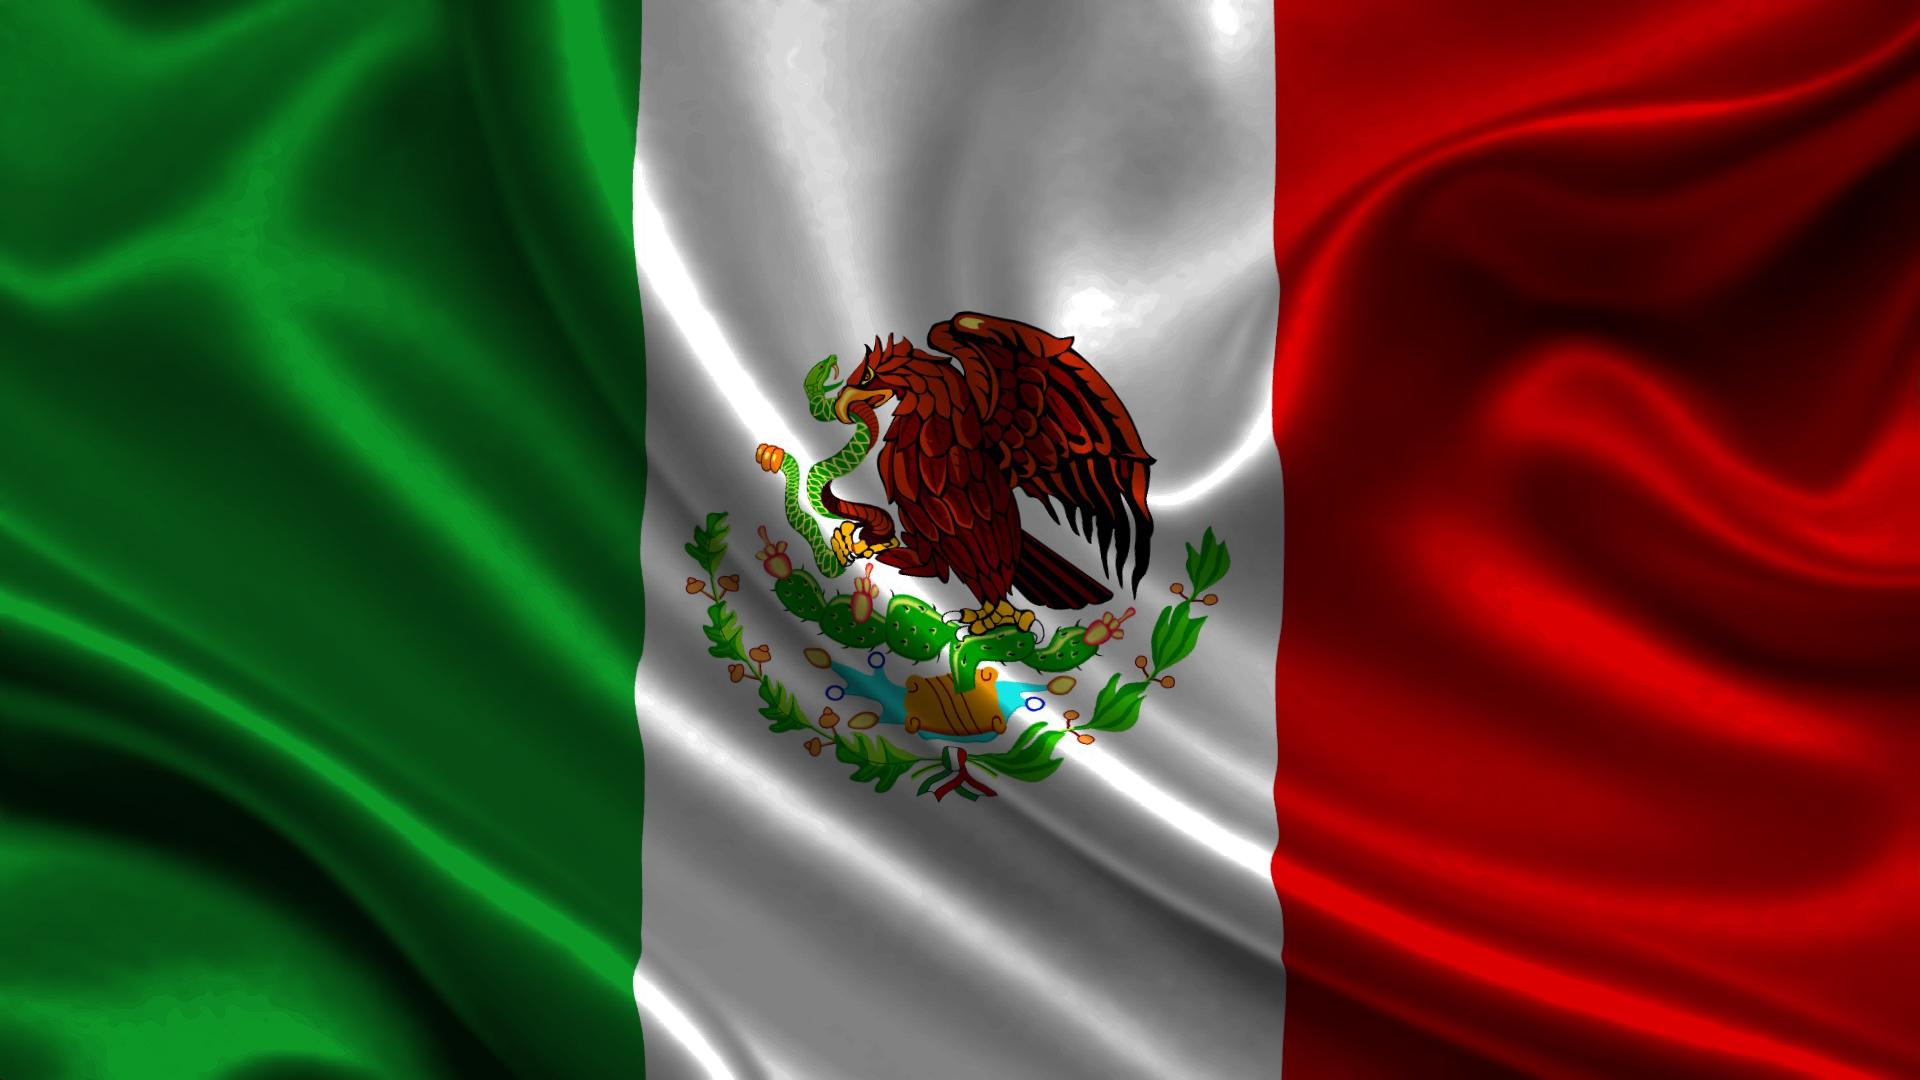 bandera de mexico 429439 mexico satin flag meksika atlasa flag 1920x1080